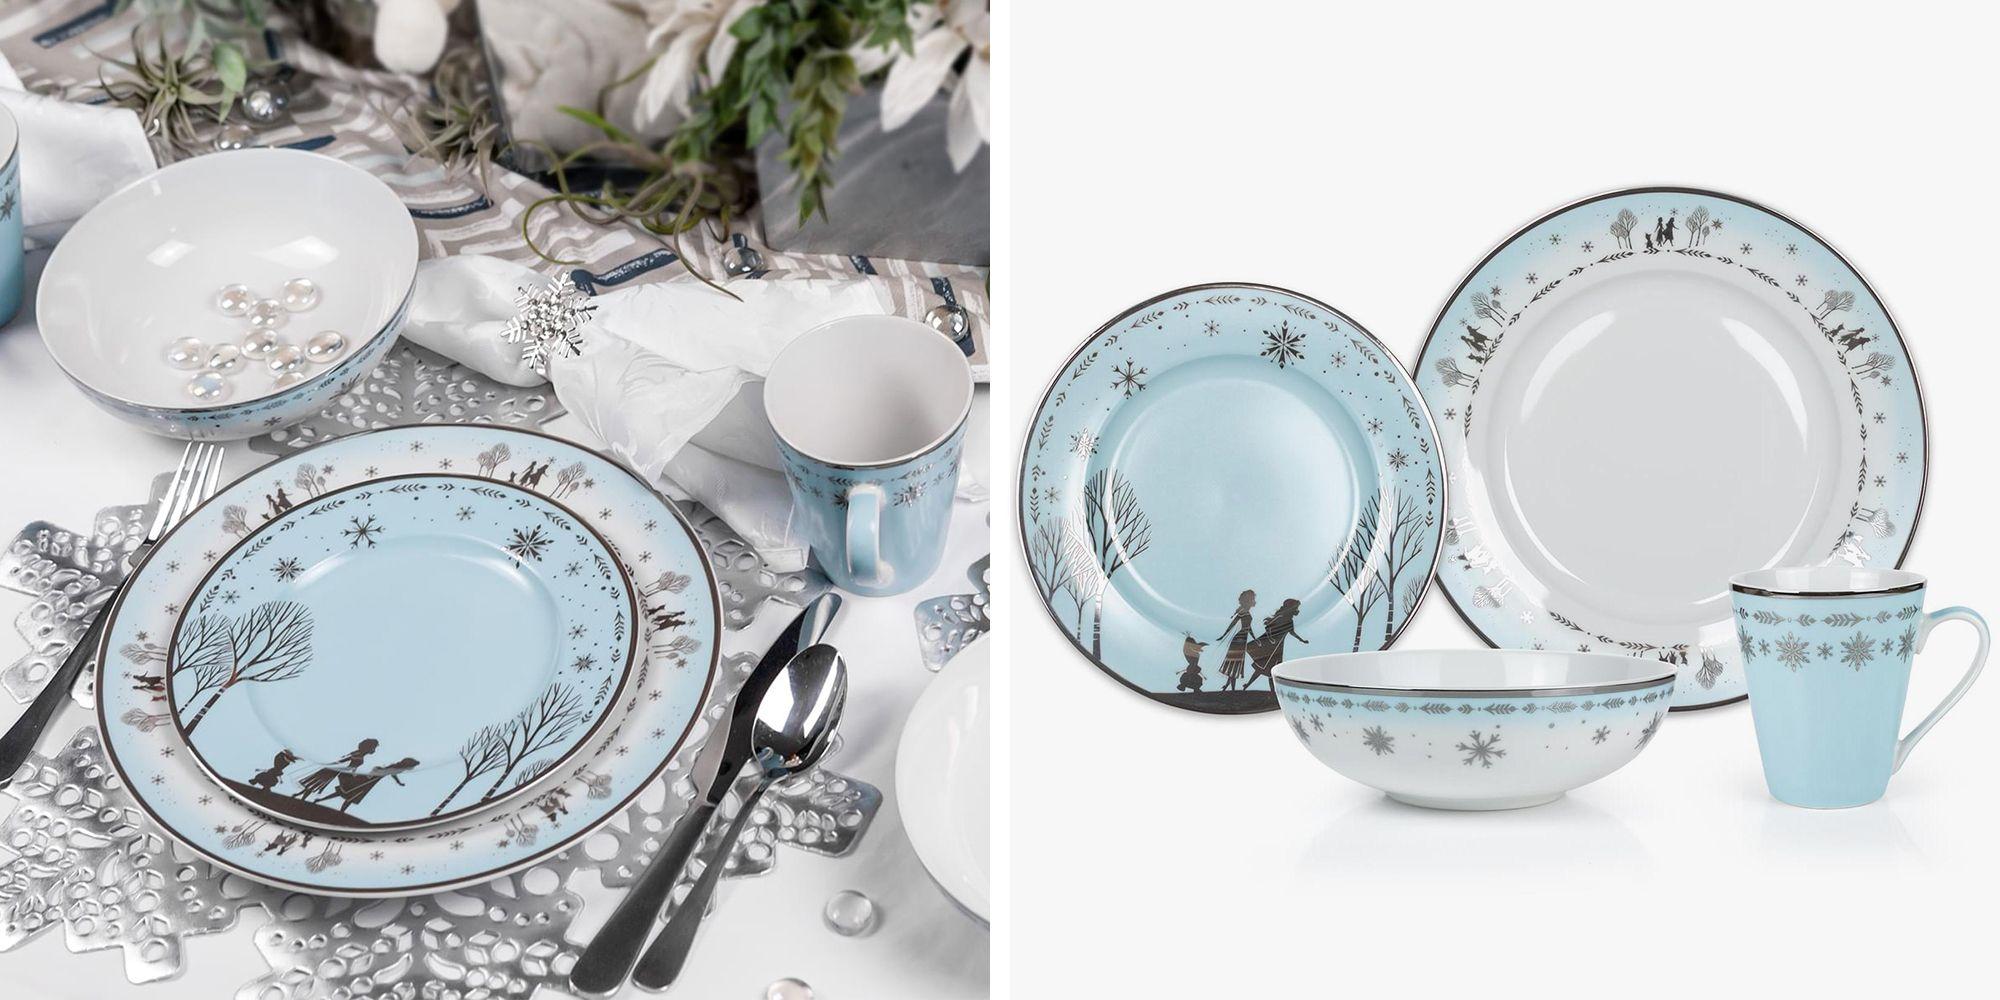 This New 'Frozen 2' Dinnerware Set Will Make Each